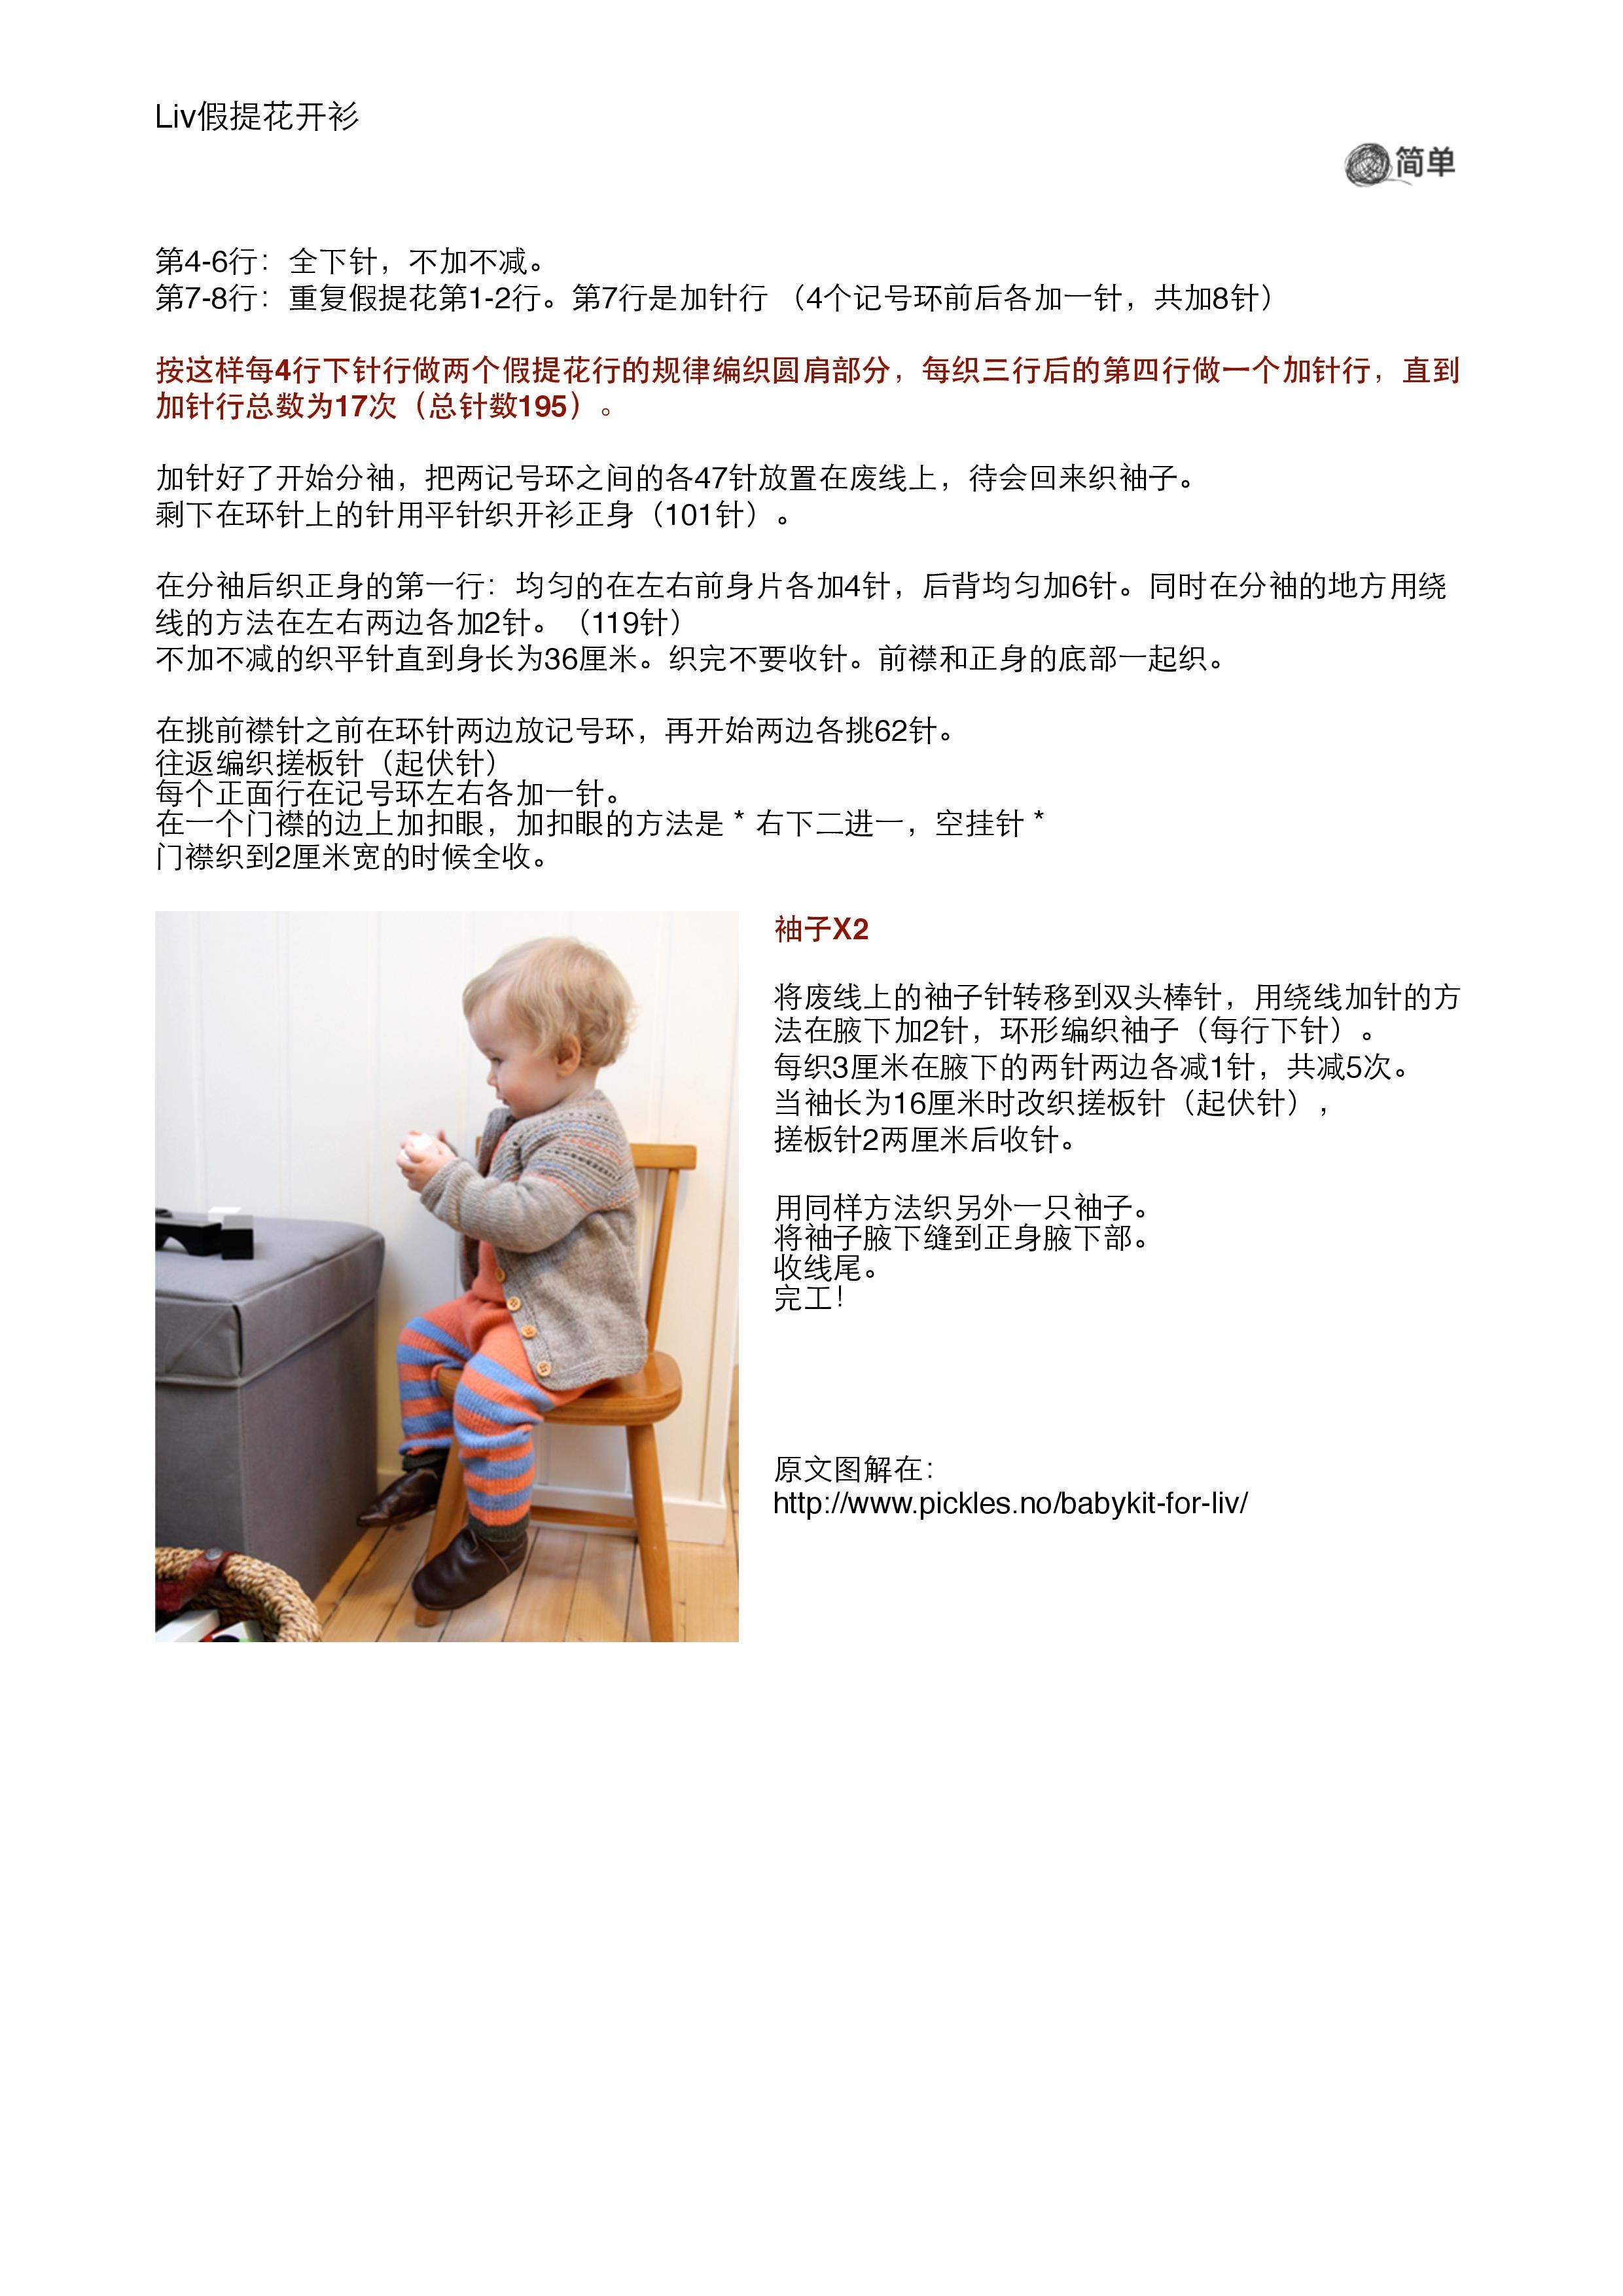 Liv-page-002.jpg